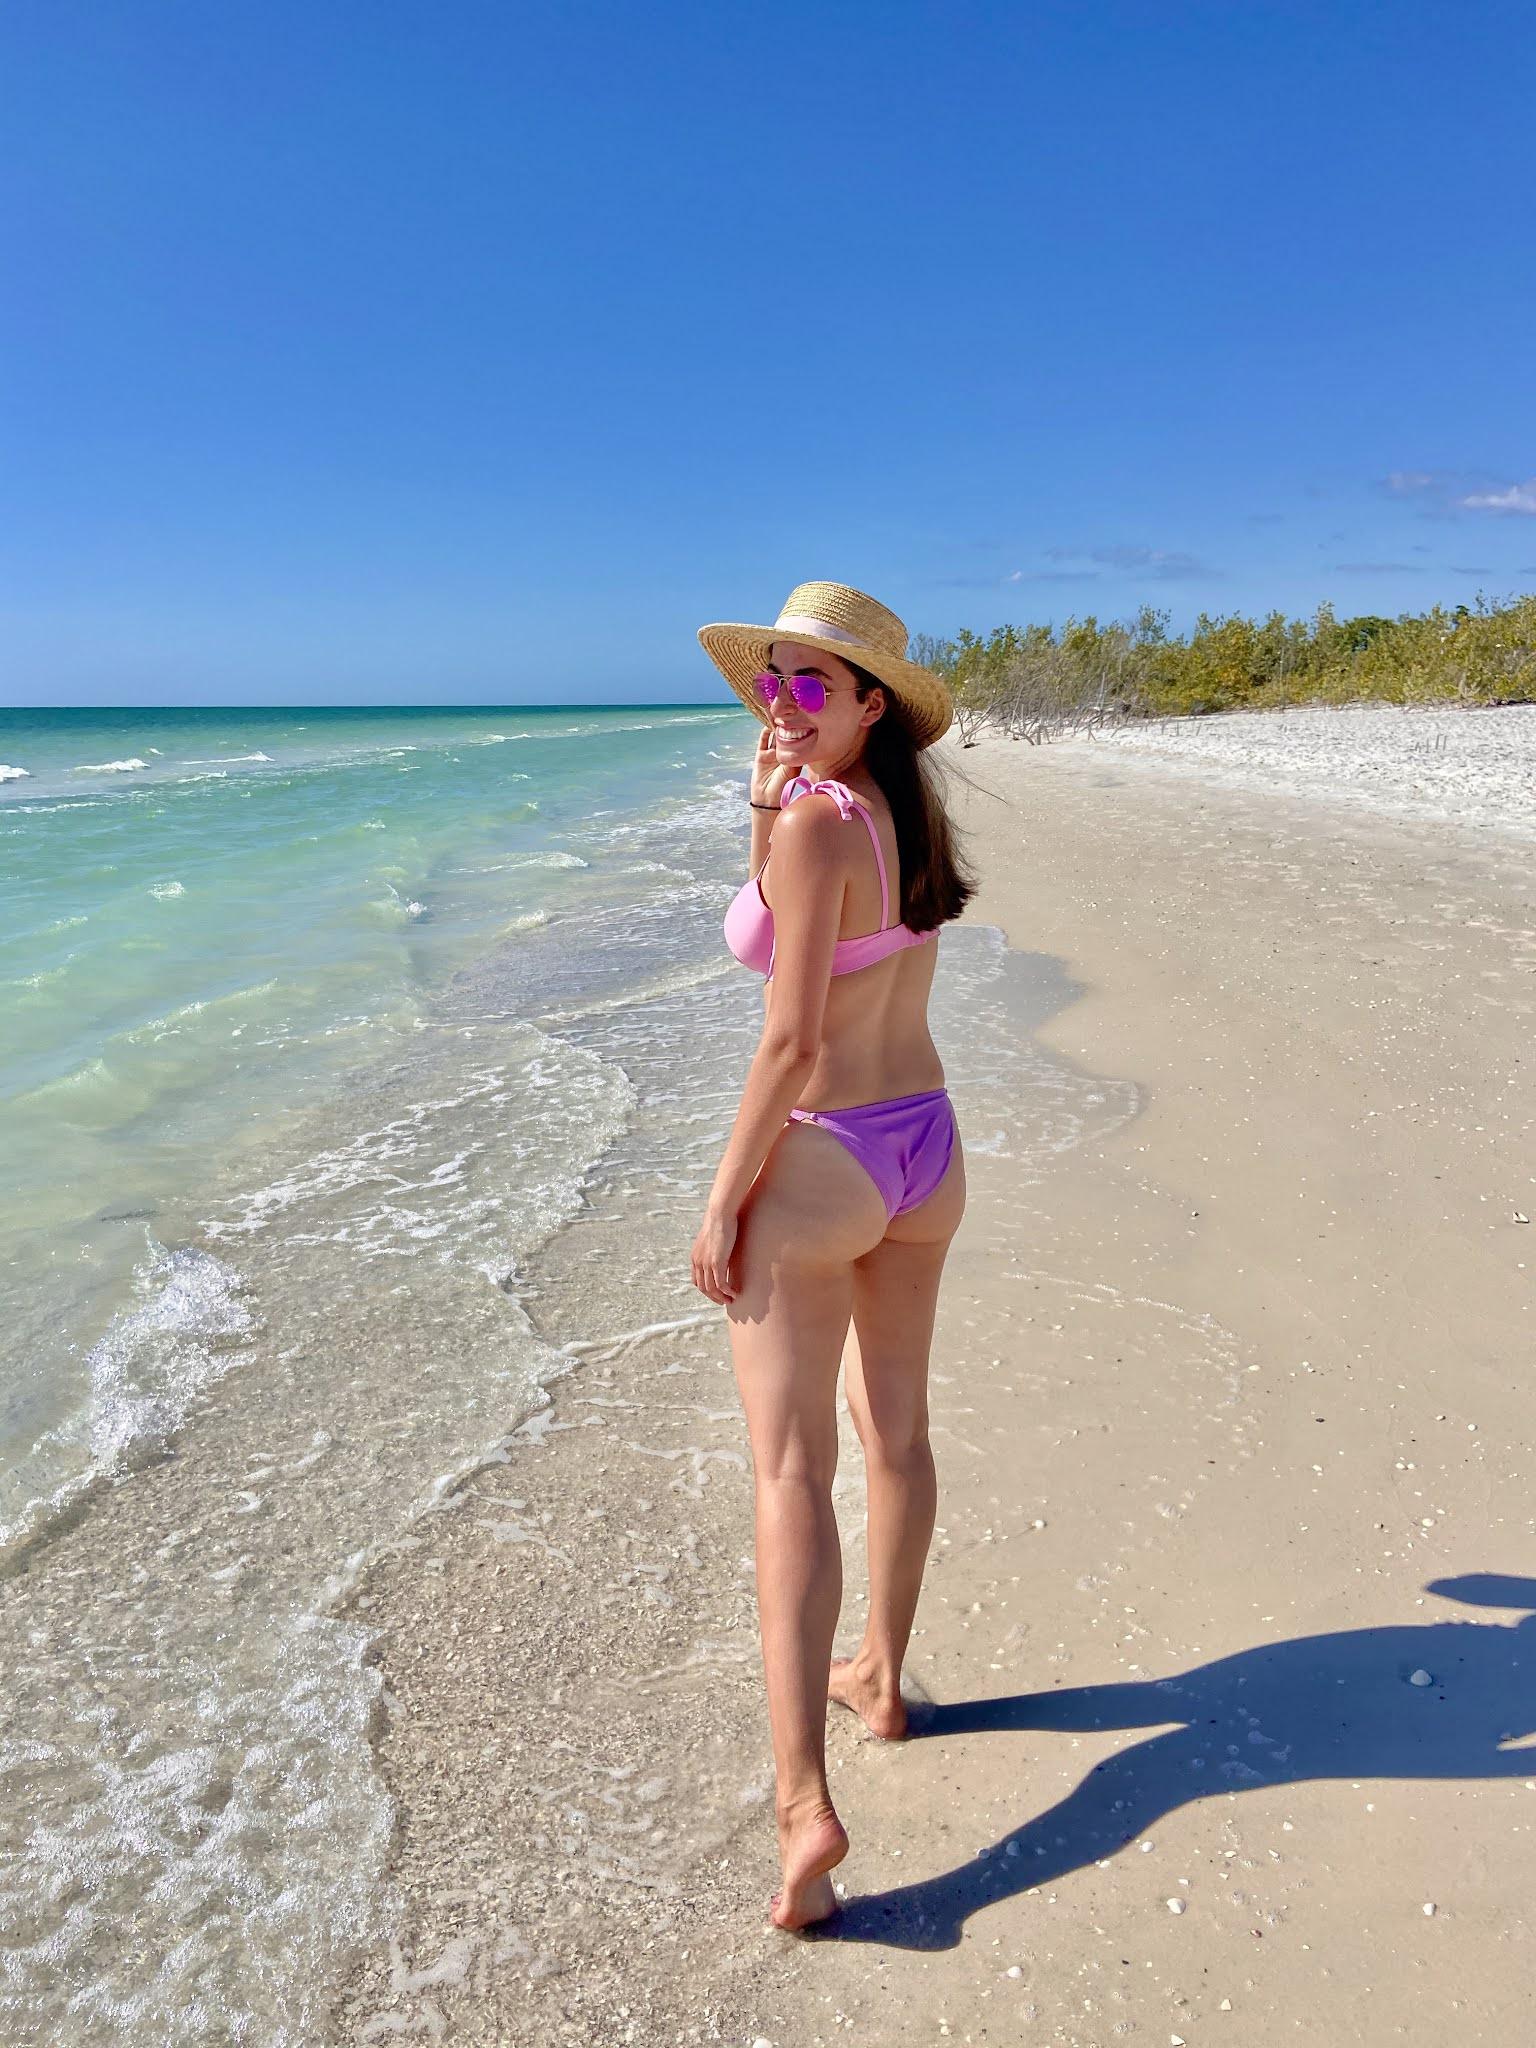 marco island, florida, bikini, bathing suit, vacation, beach style, beach vacation